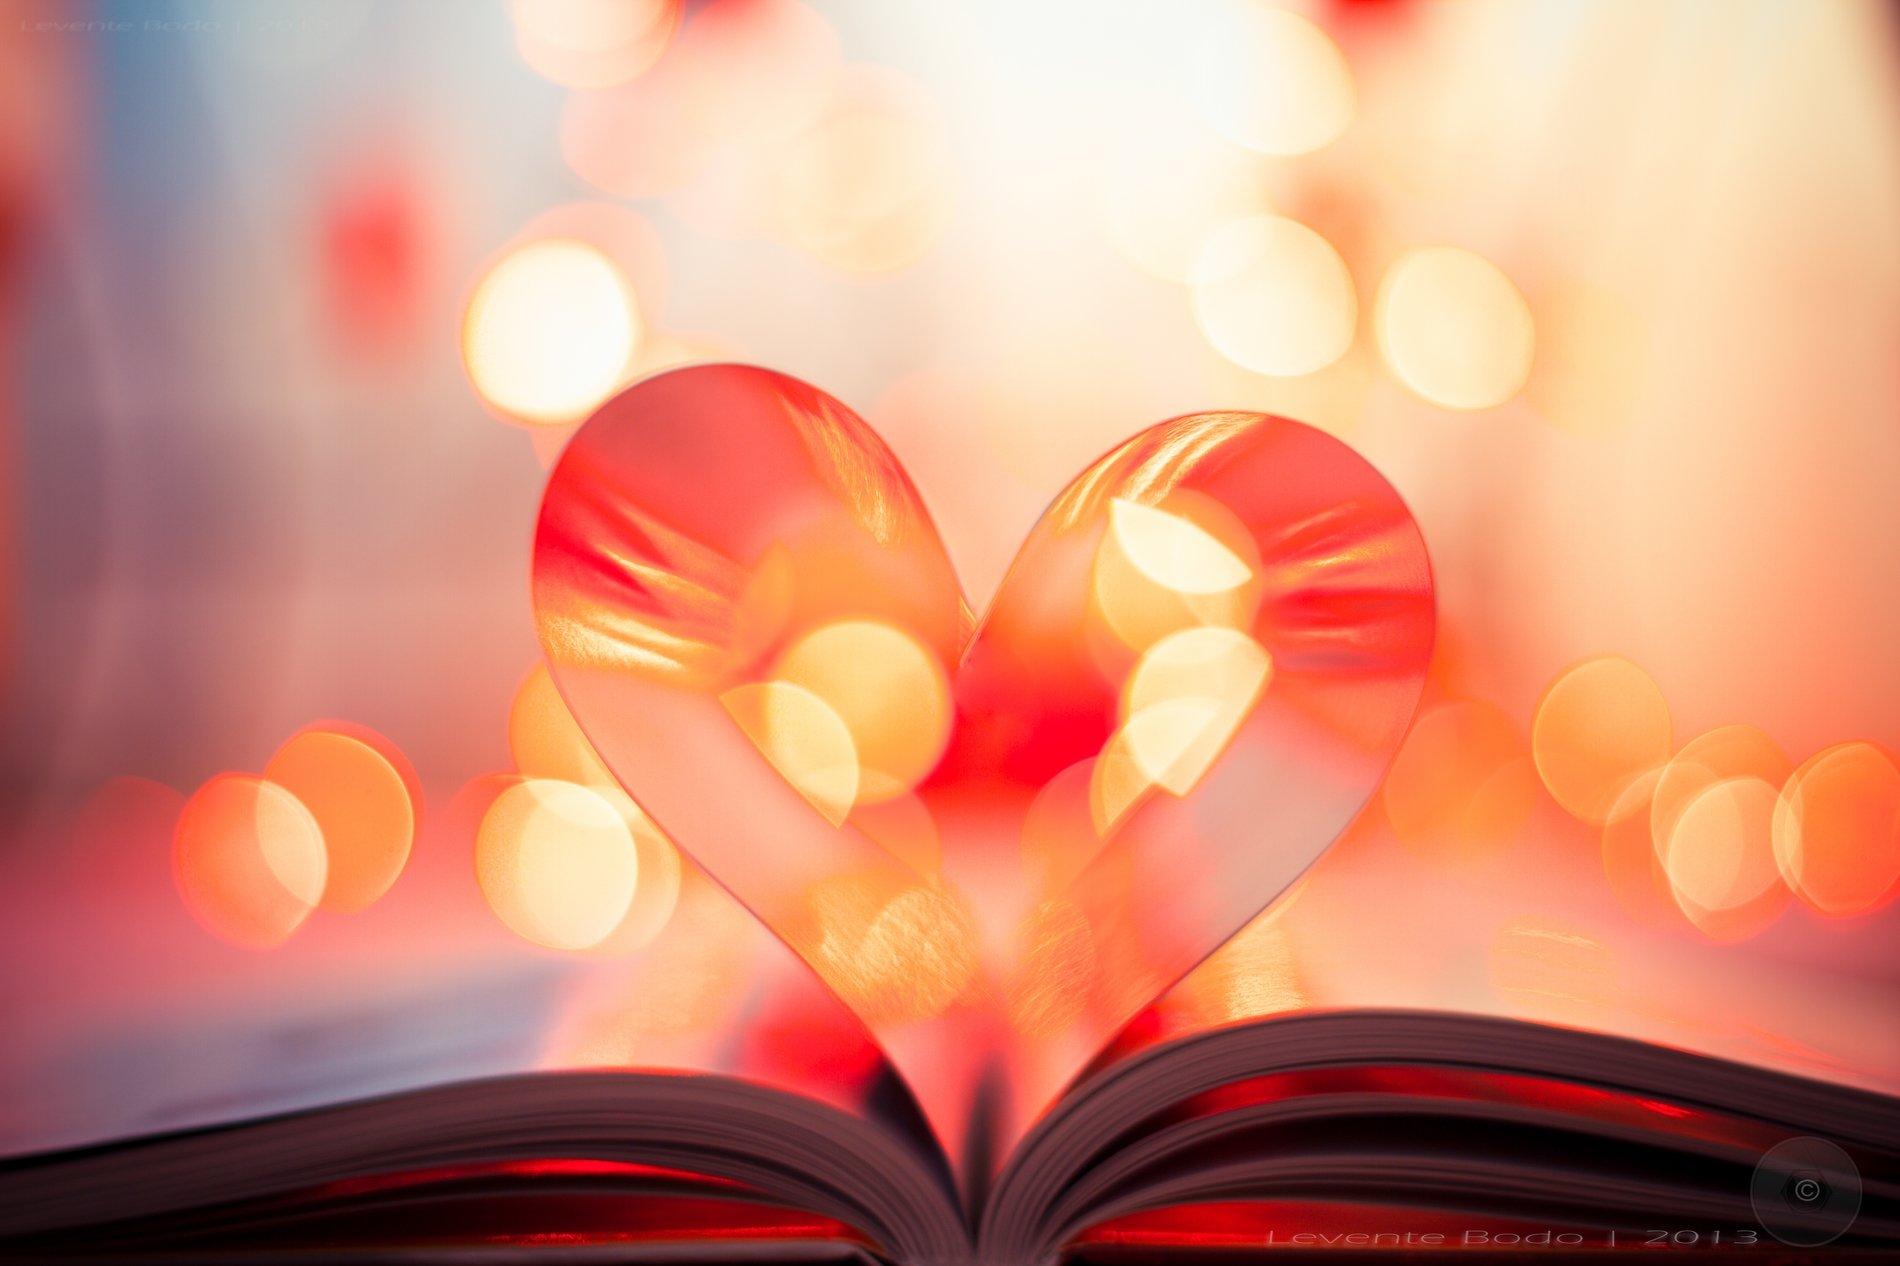 Love Wallpapers Big Size : Mood love hearts bokeh book wallpaper 1900x1266 608506 ...